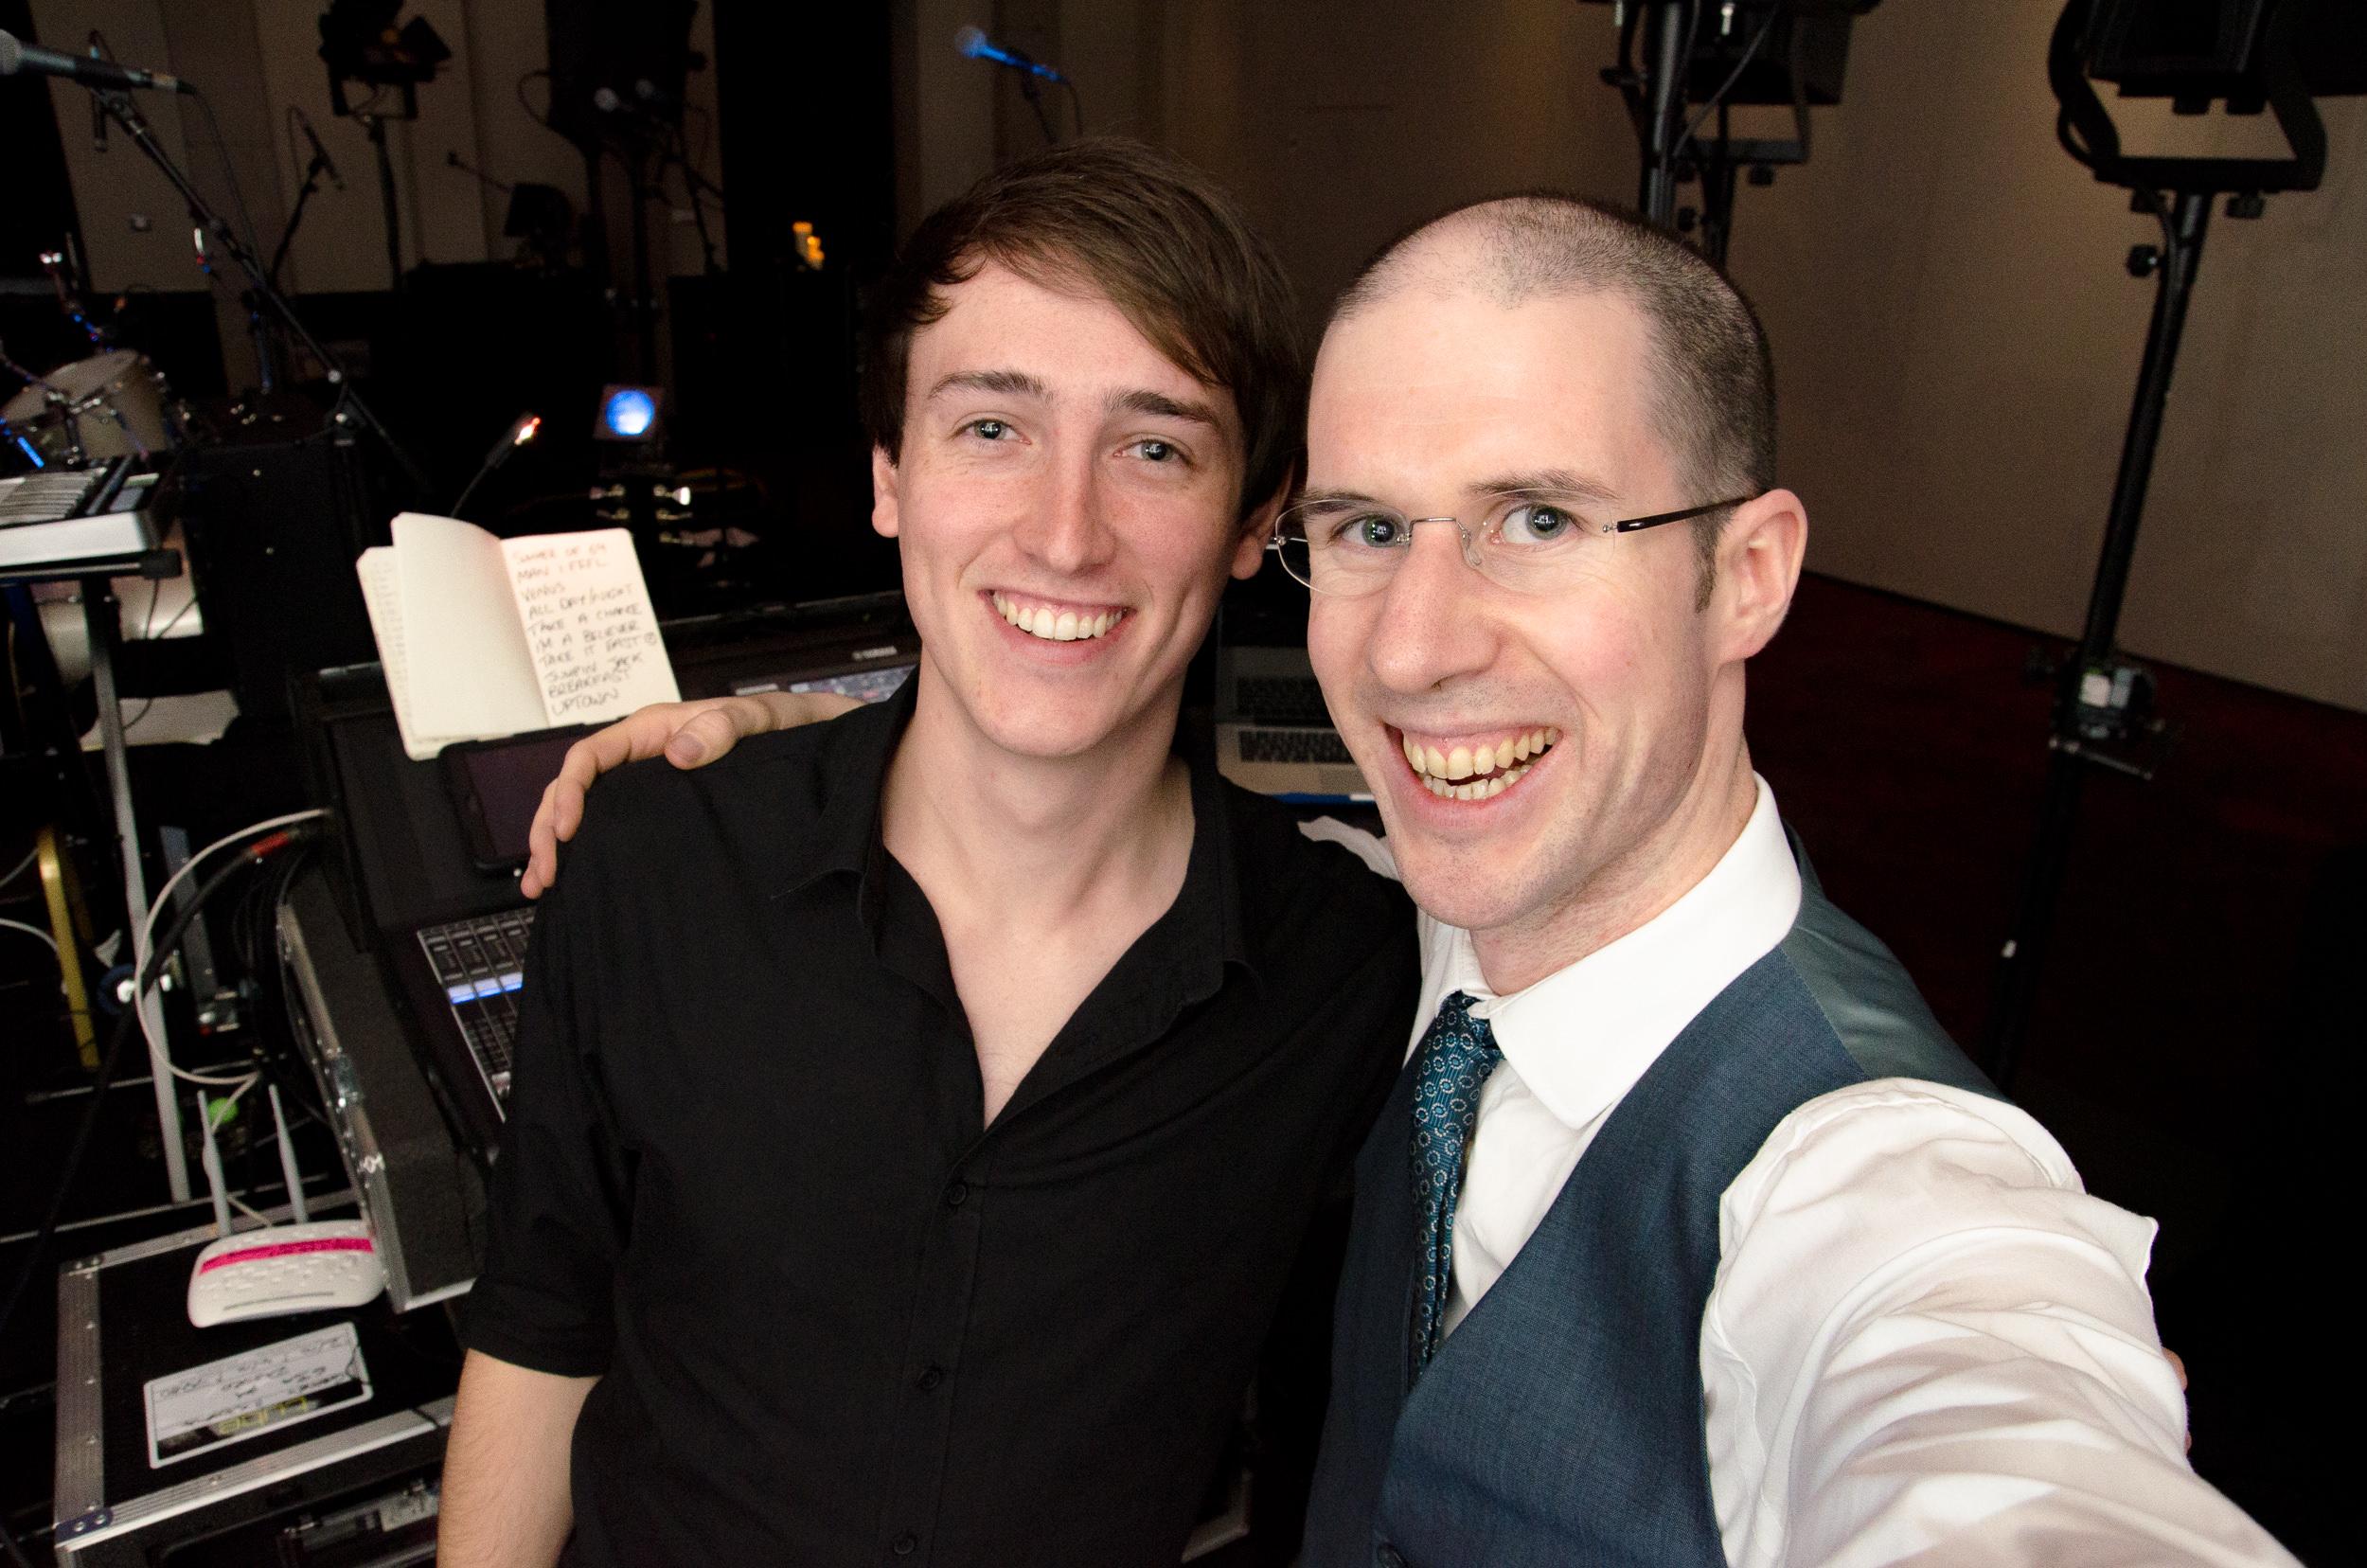 Adam (Sound Engineer) from Tube